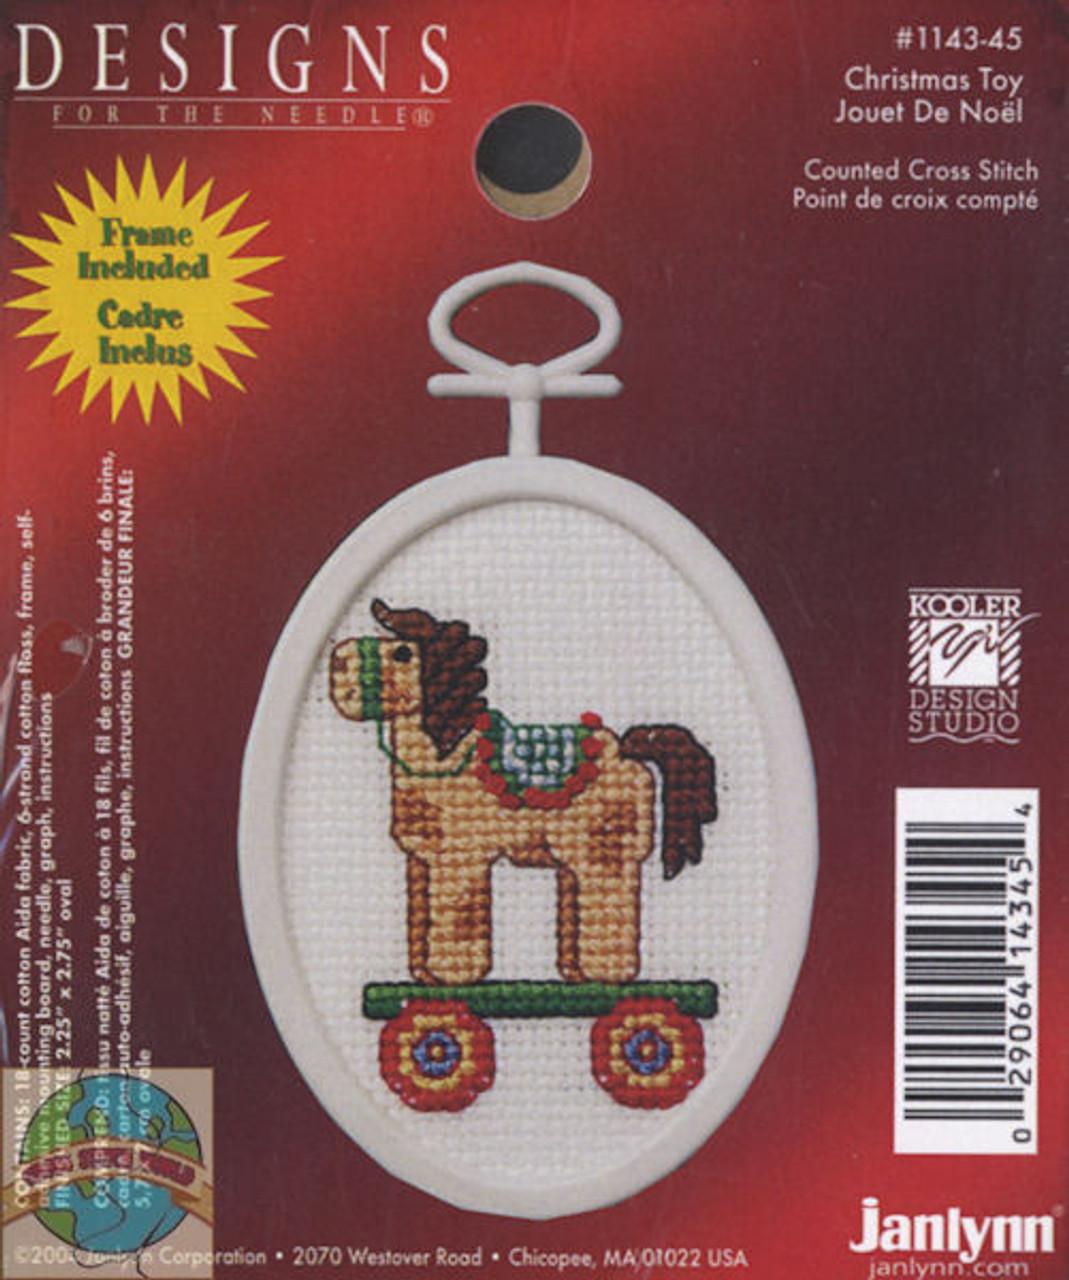 Janlynn Minis - Christmas Toy